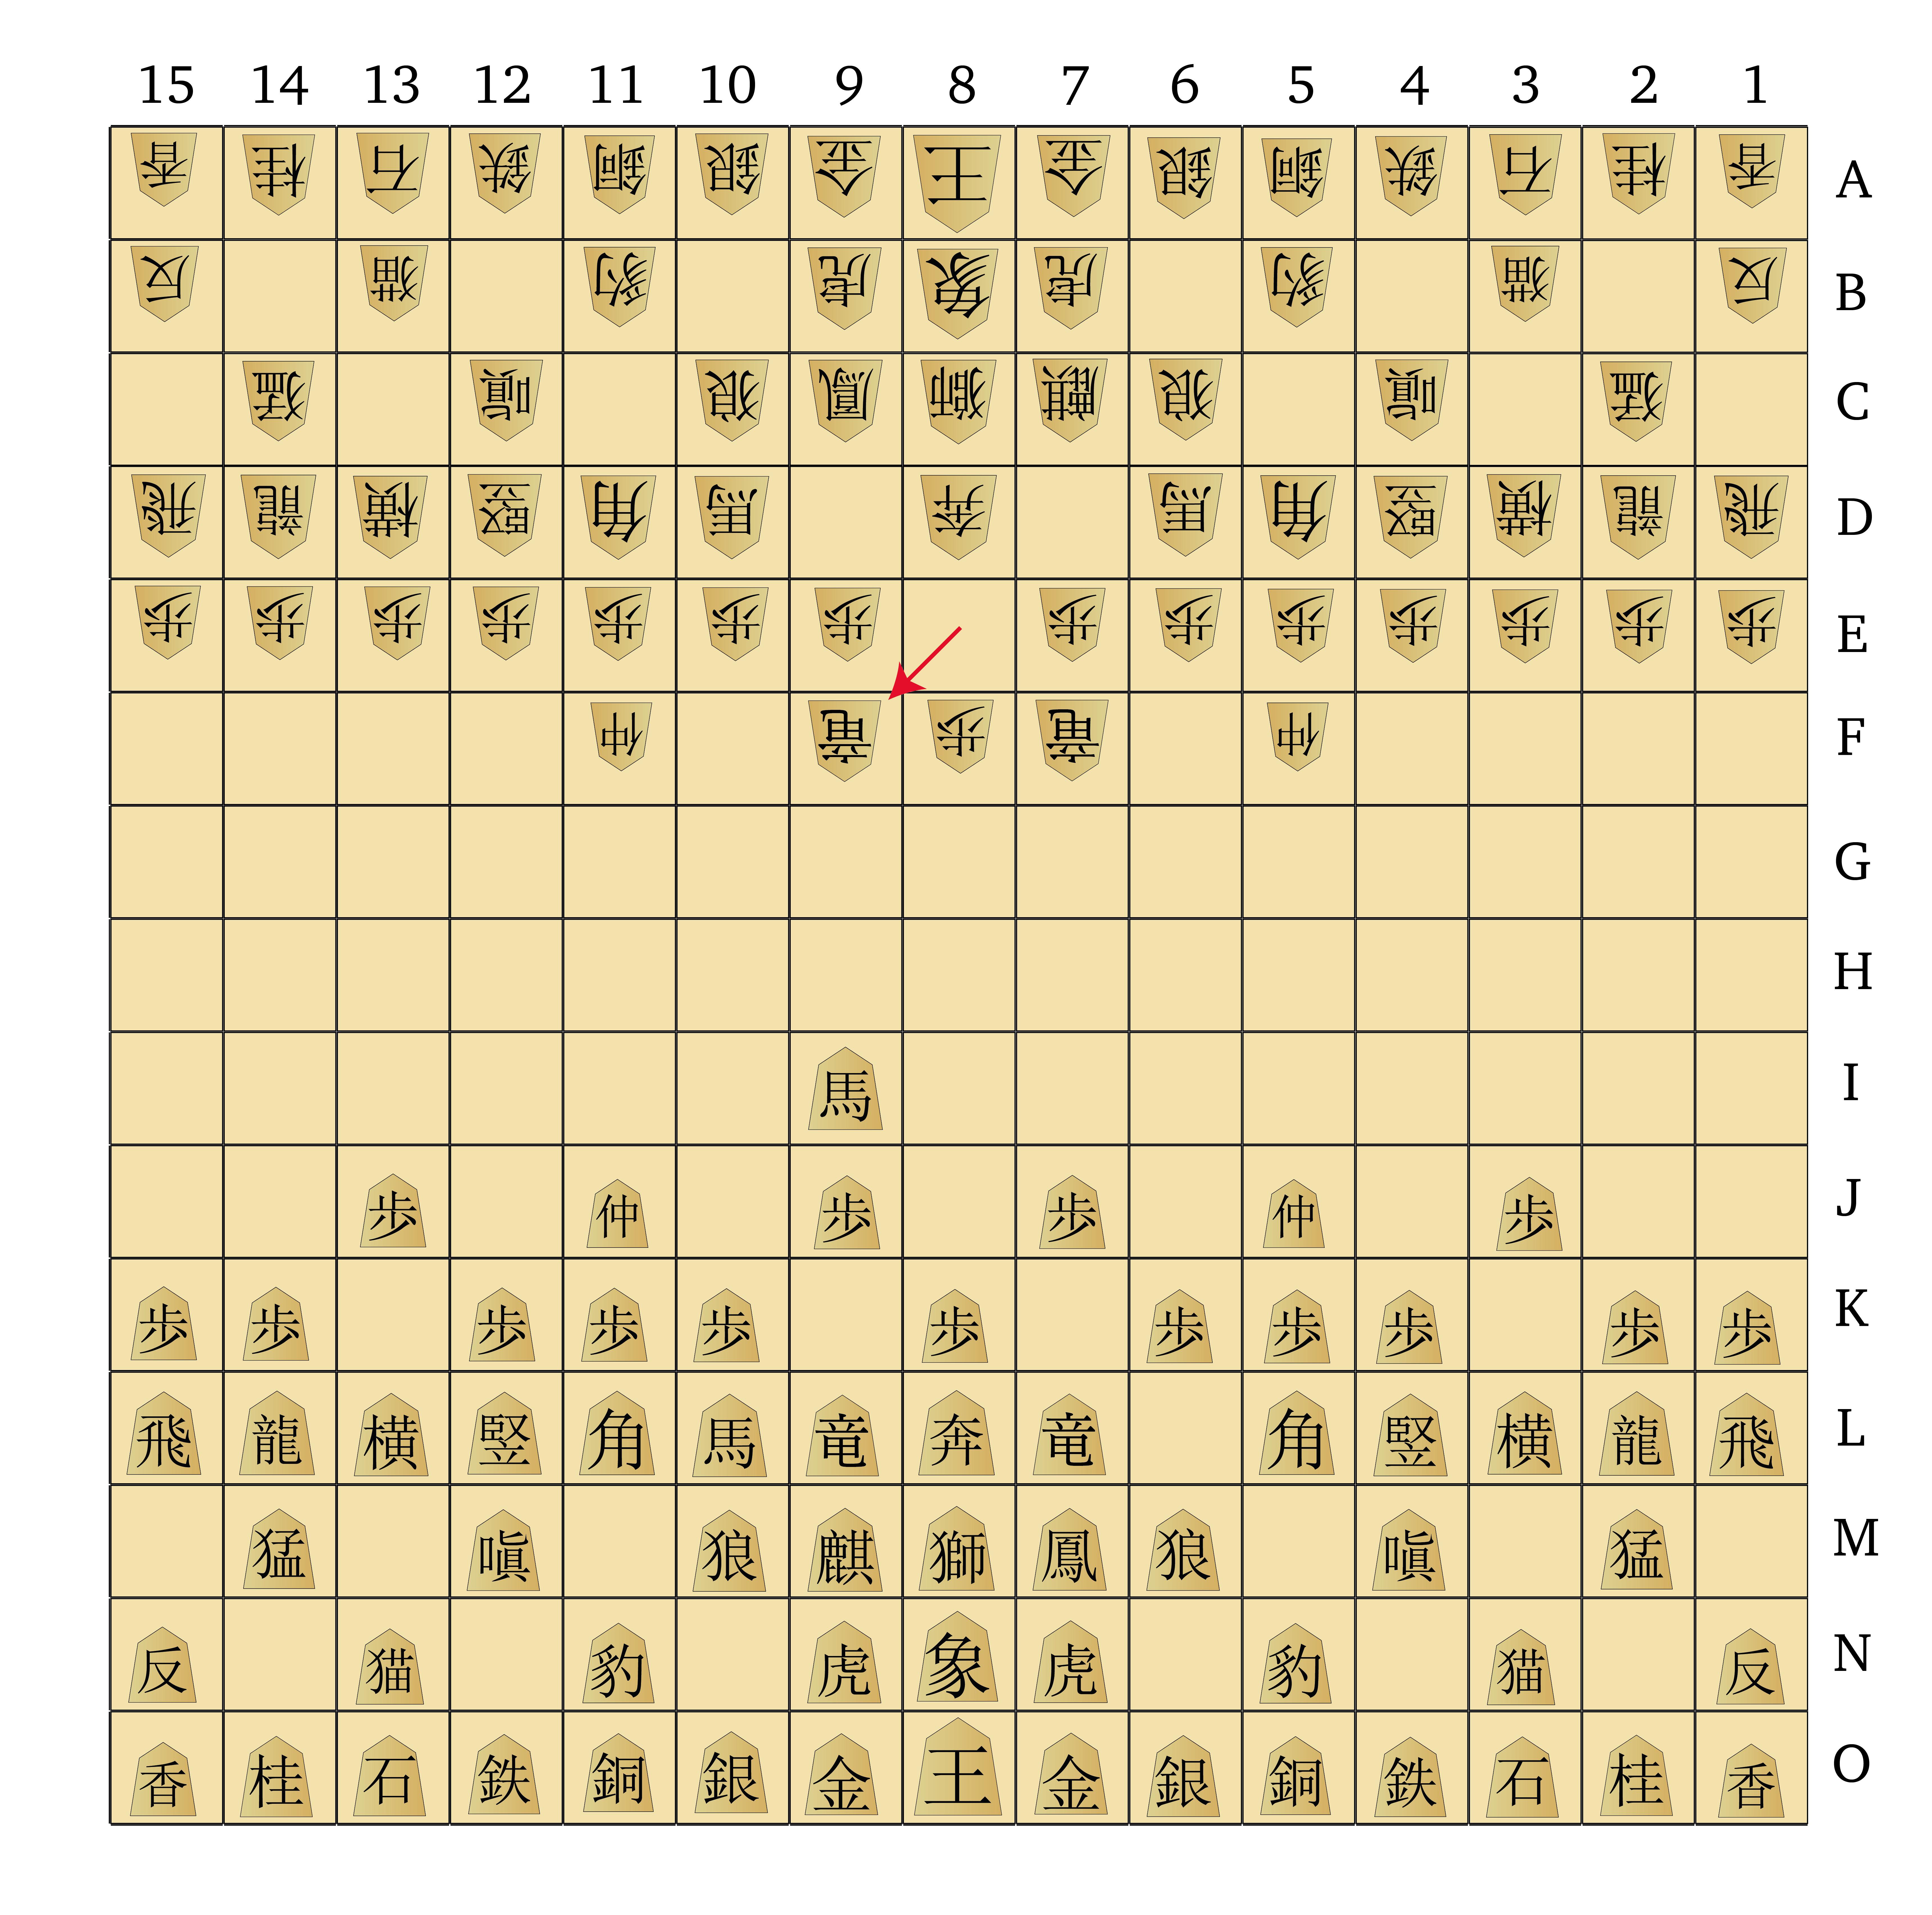 Dai Shogi 420 -- Move 10-01